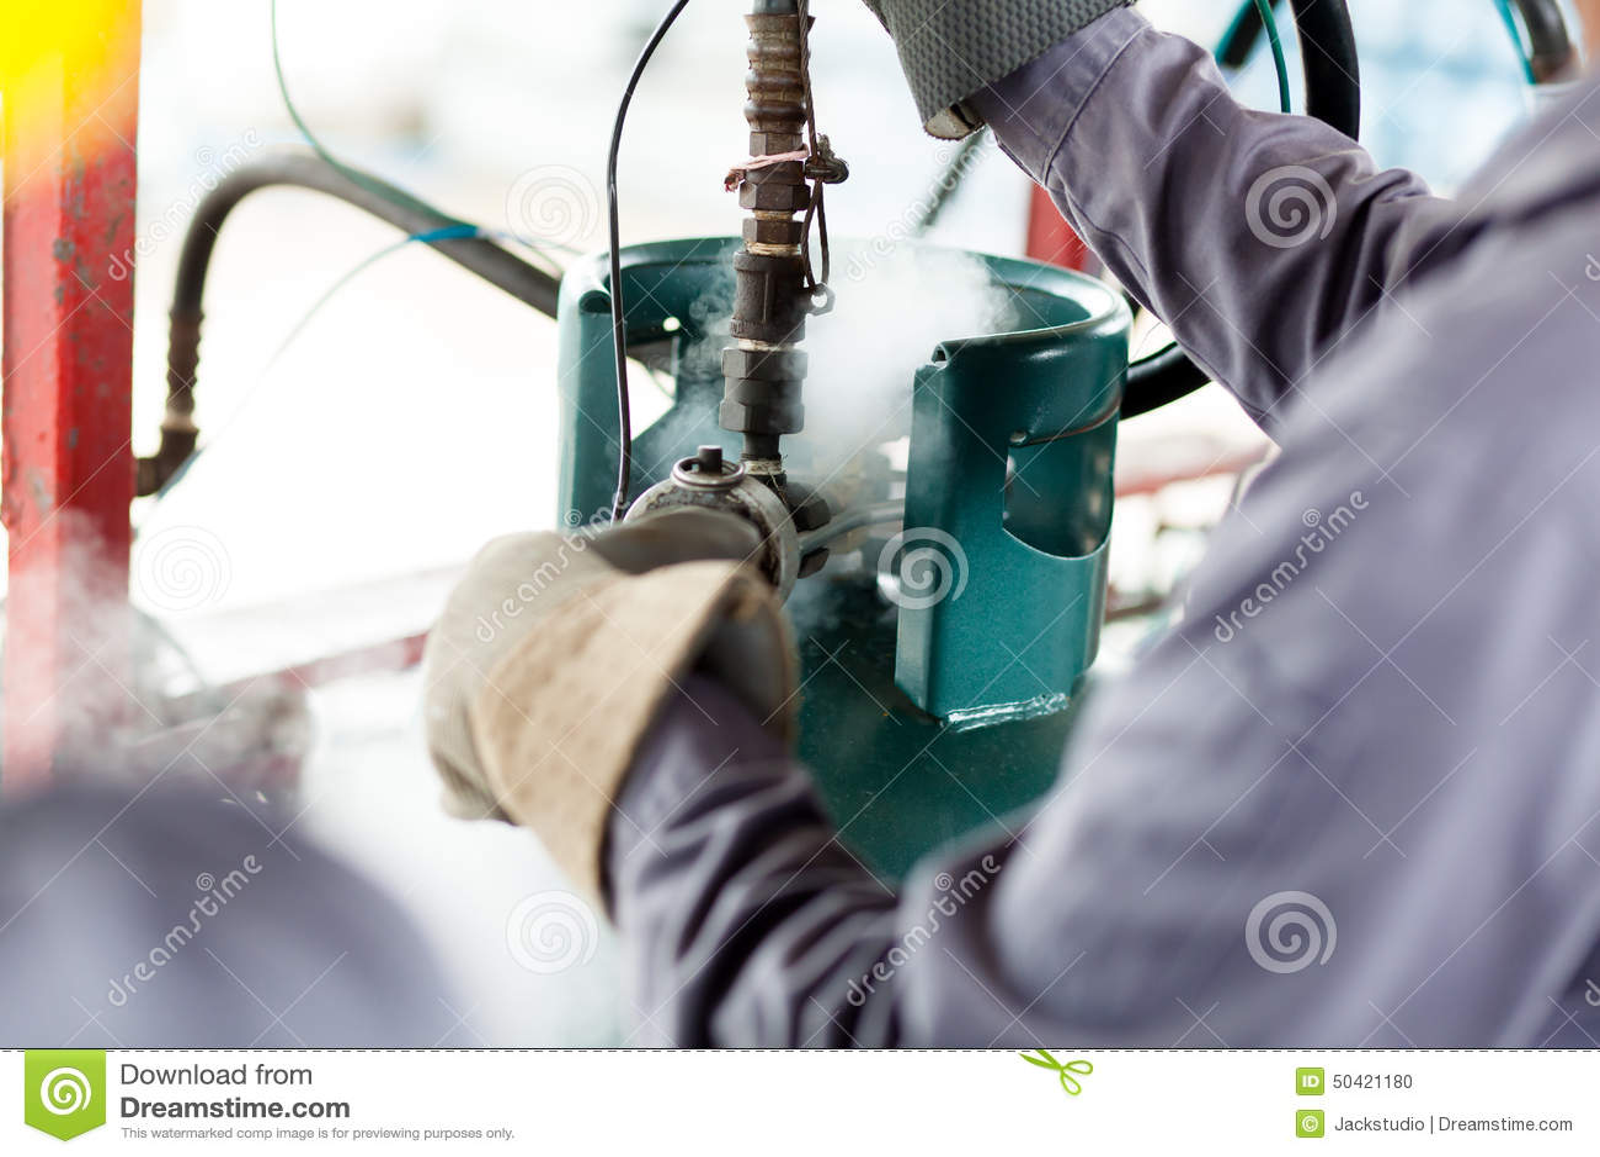 Man Work A Propane Tank Stock Photo - Image: 50421180